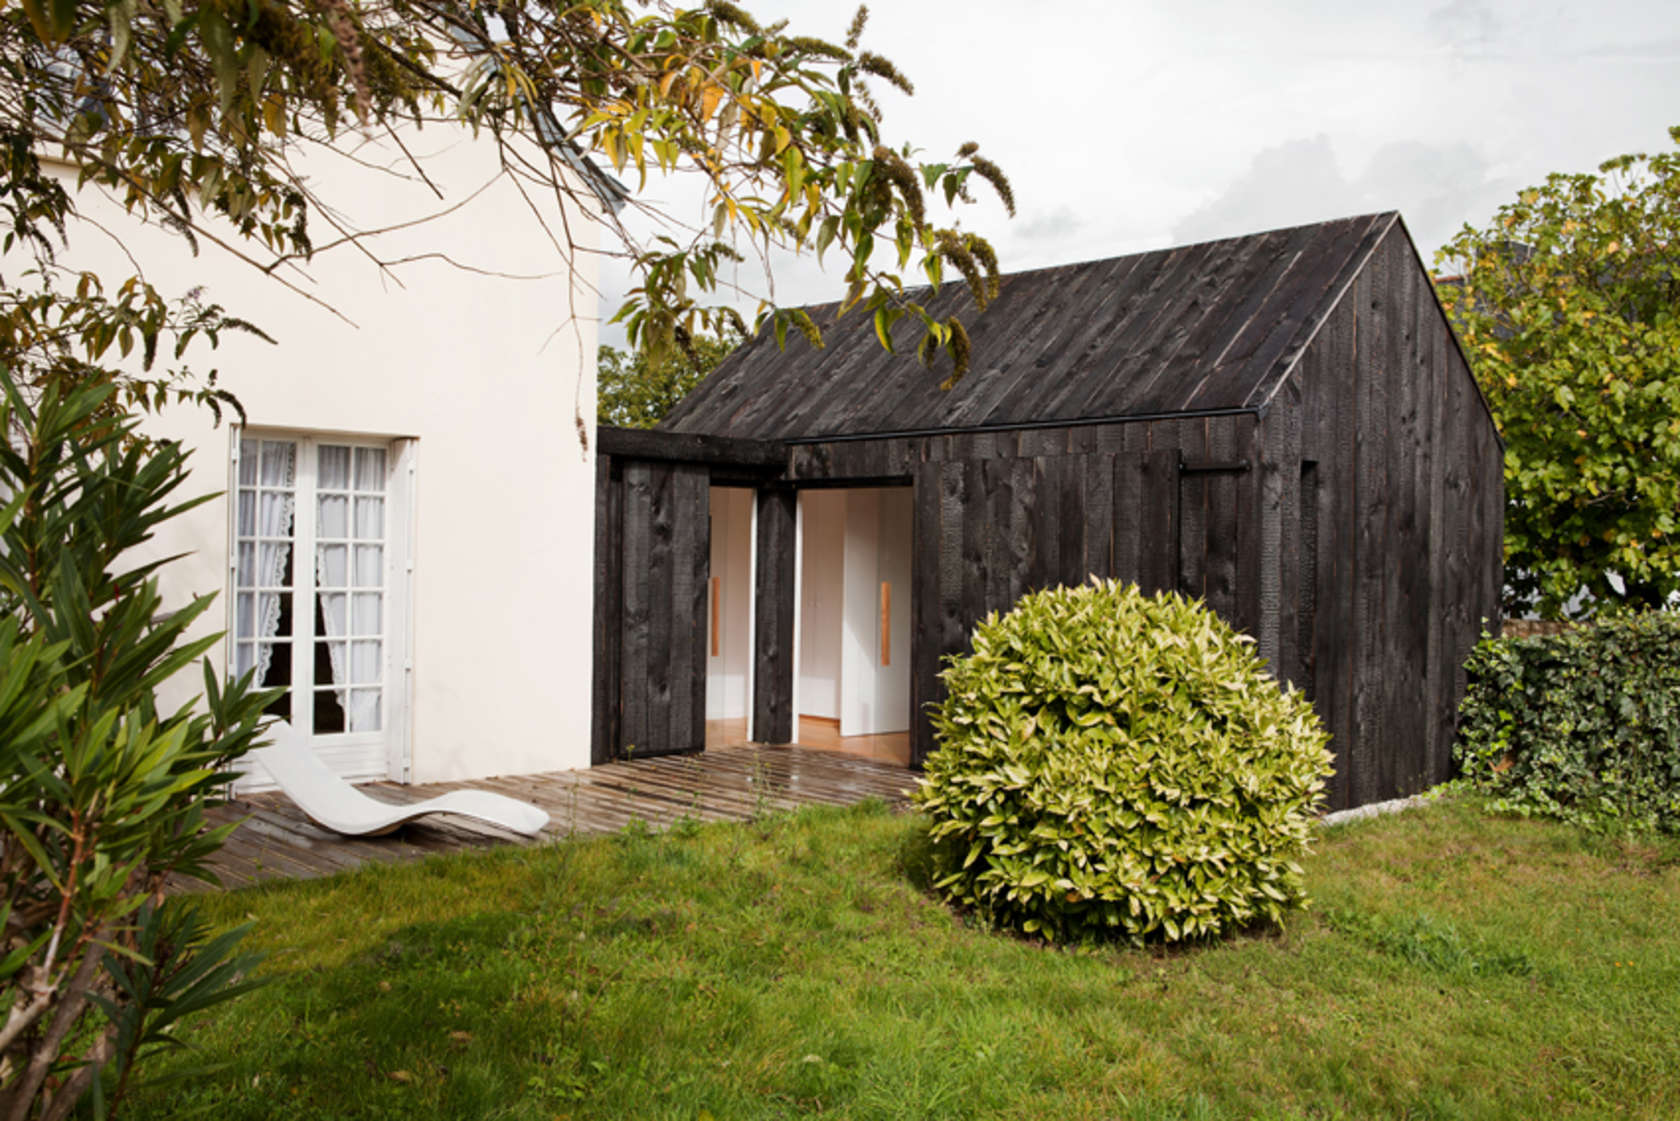 maison en bois br l architizer. Black Bedroom Furniture Sets. Home Design Ideas